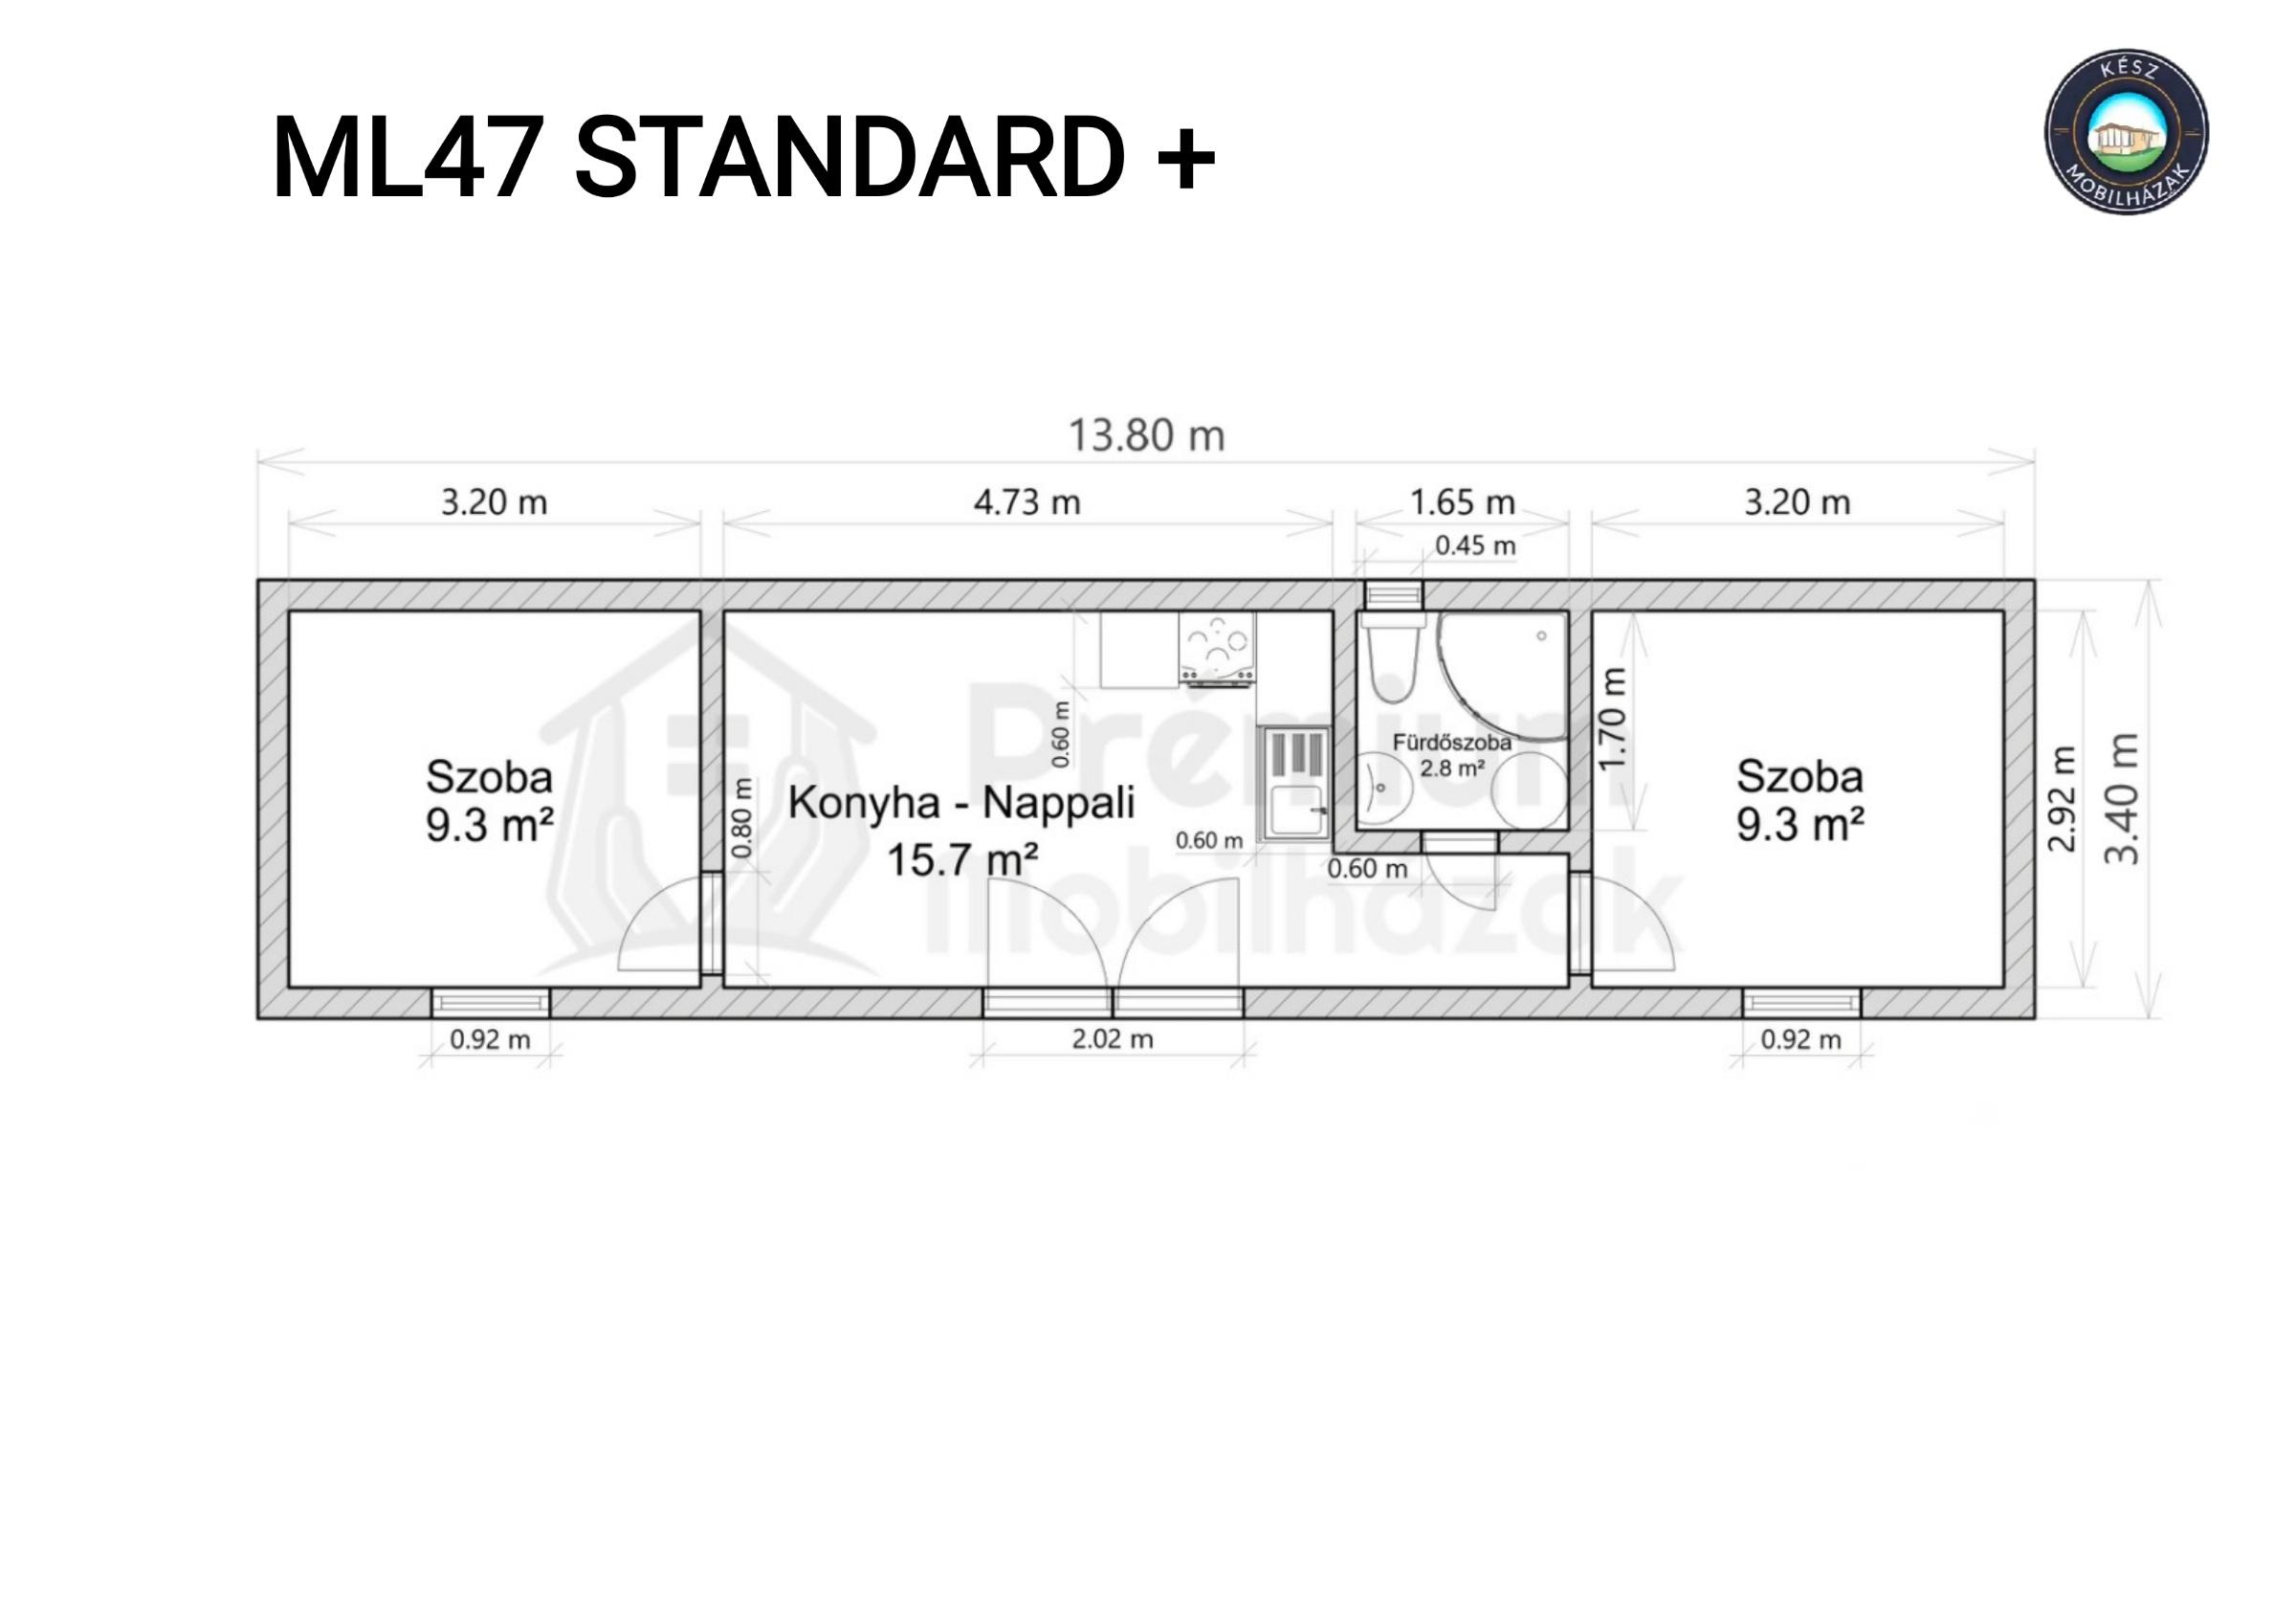 ML47 STANDARD+